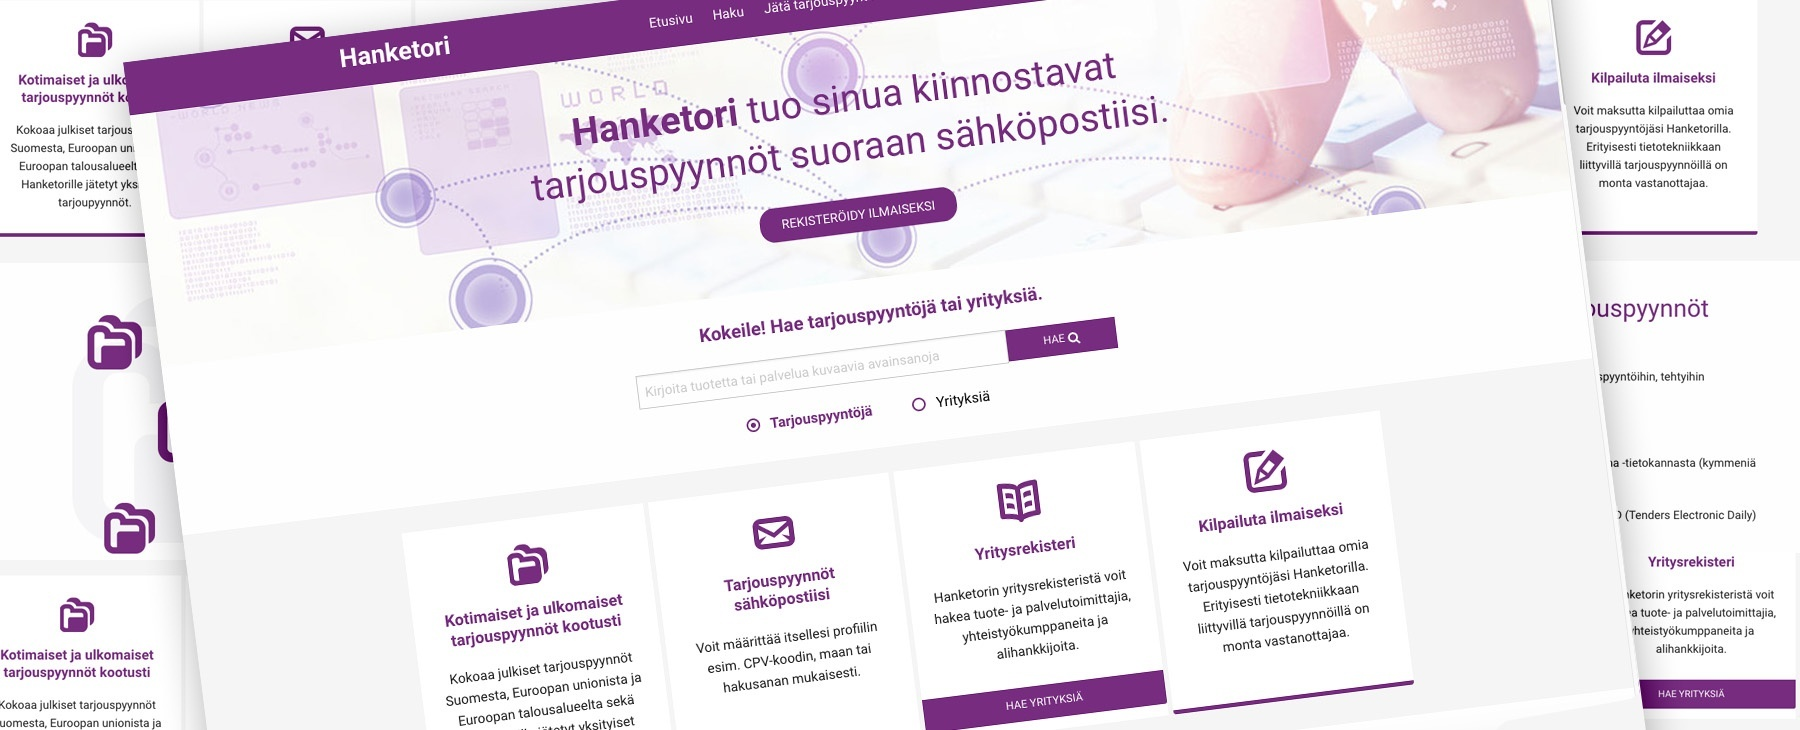 Hanketori.fi